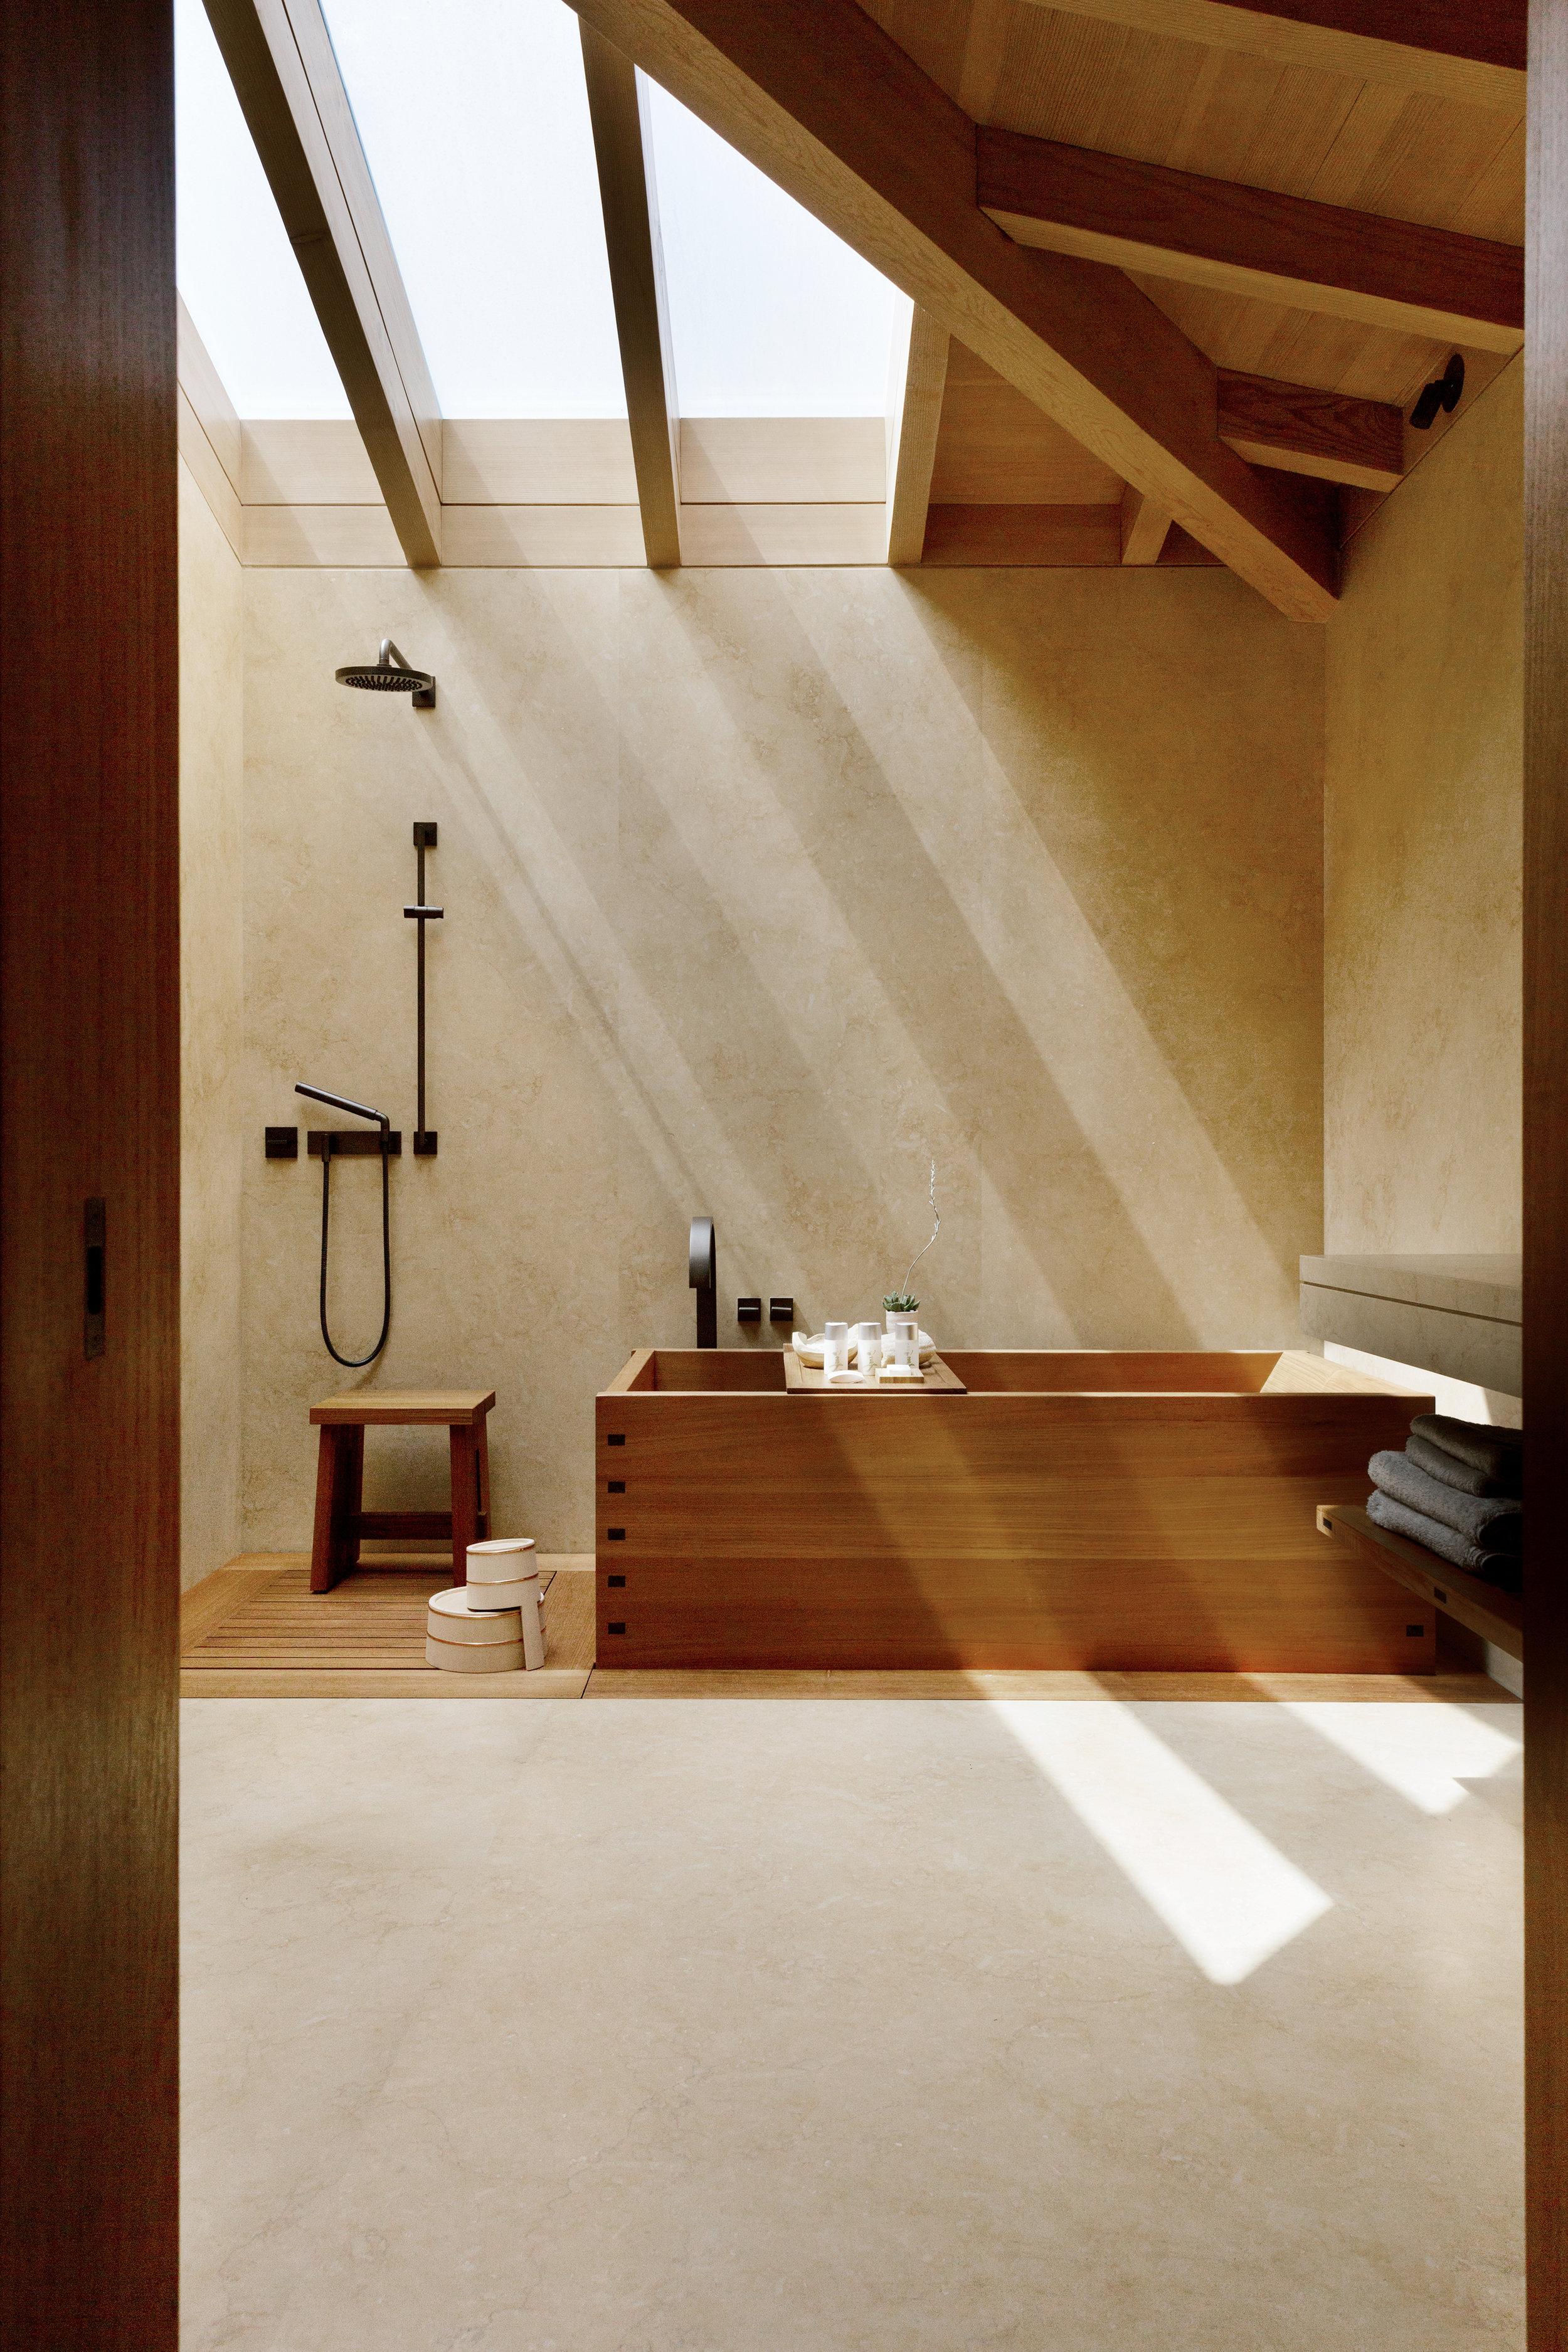 Bathroom at Nobu Ryokan, courtesy of Studio PCH